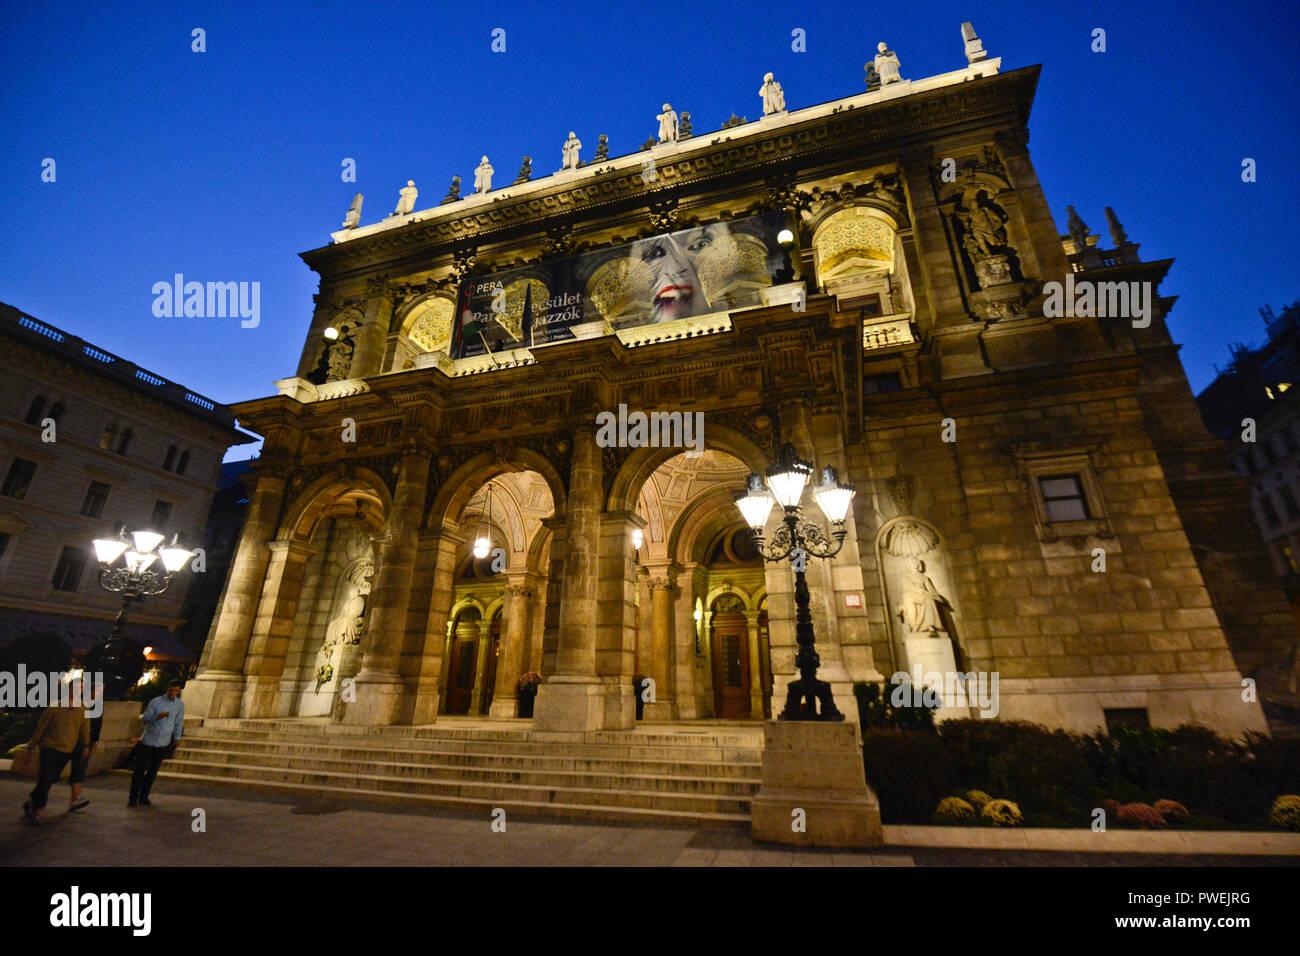 Hungarian State Opera House. Budapest, Hungary - Stock Image